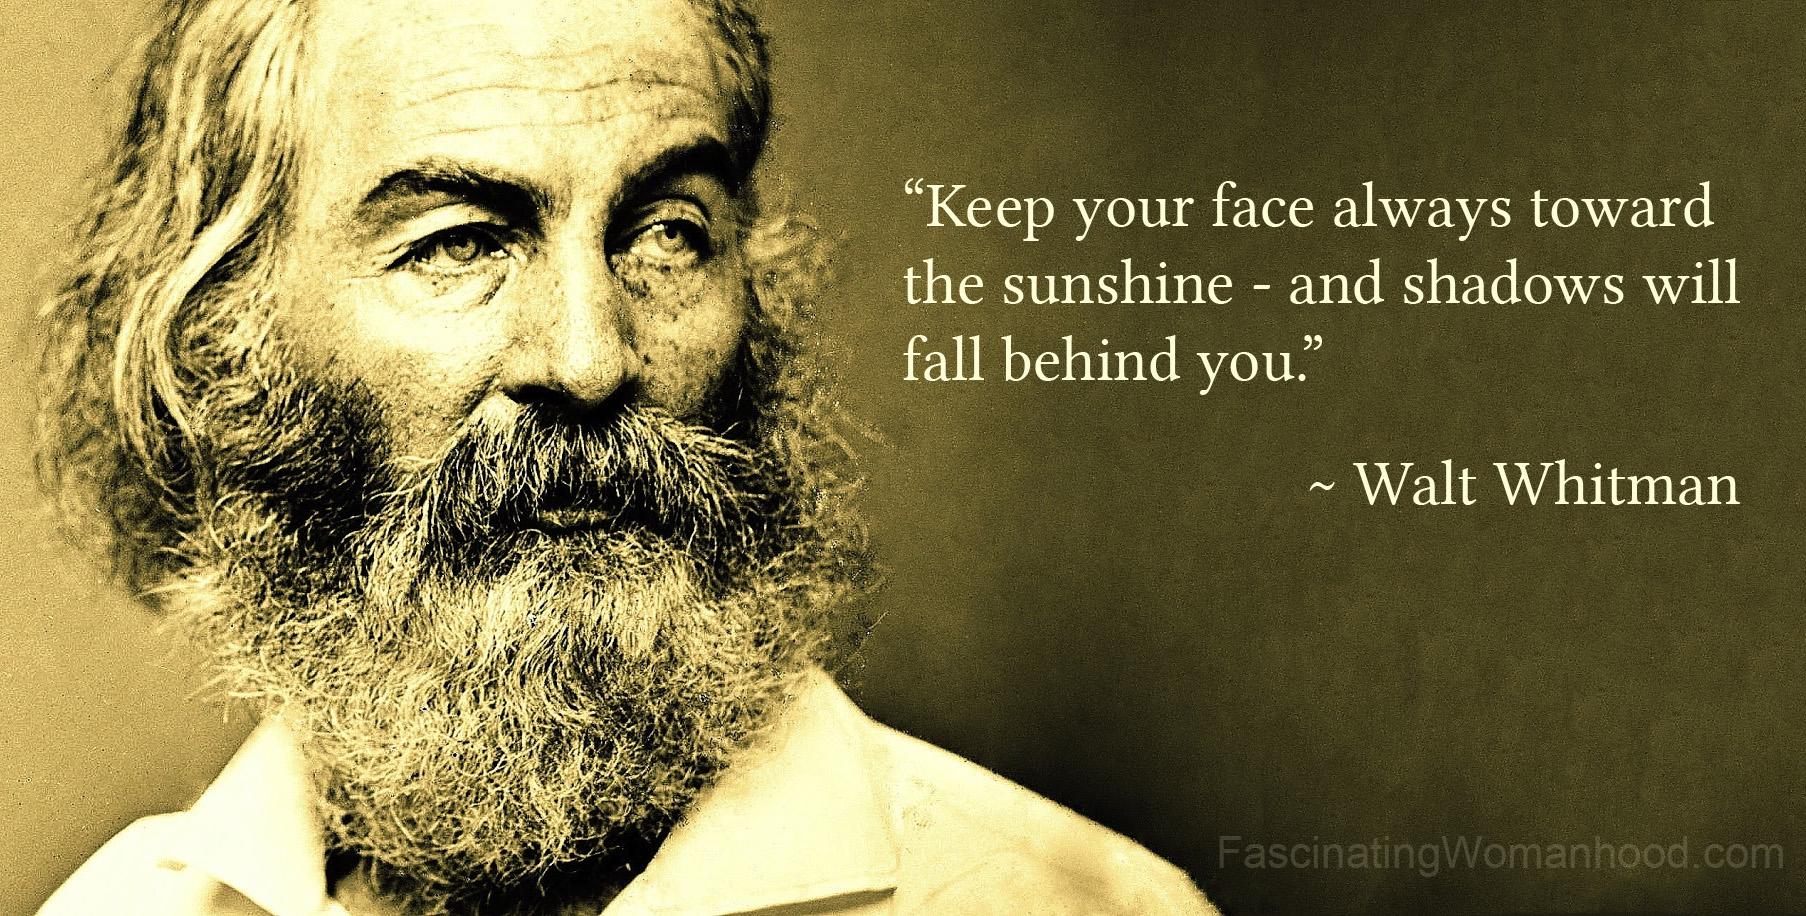 A Quote by Walt Whitman.jpg